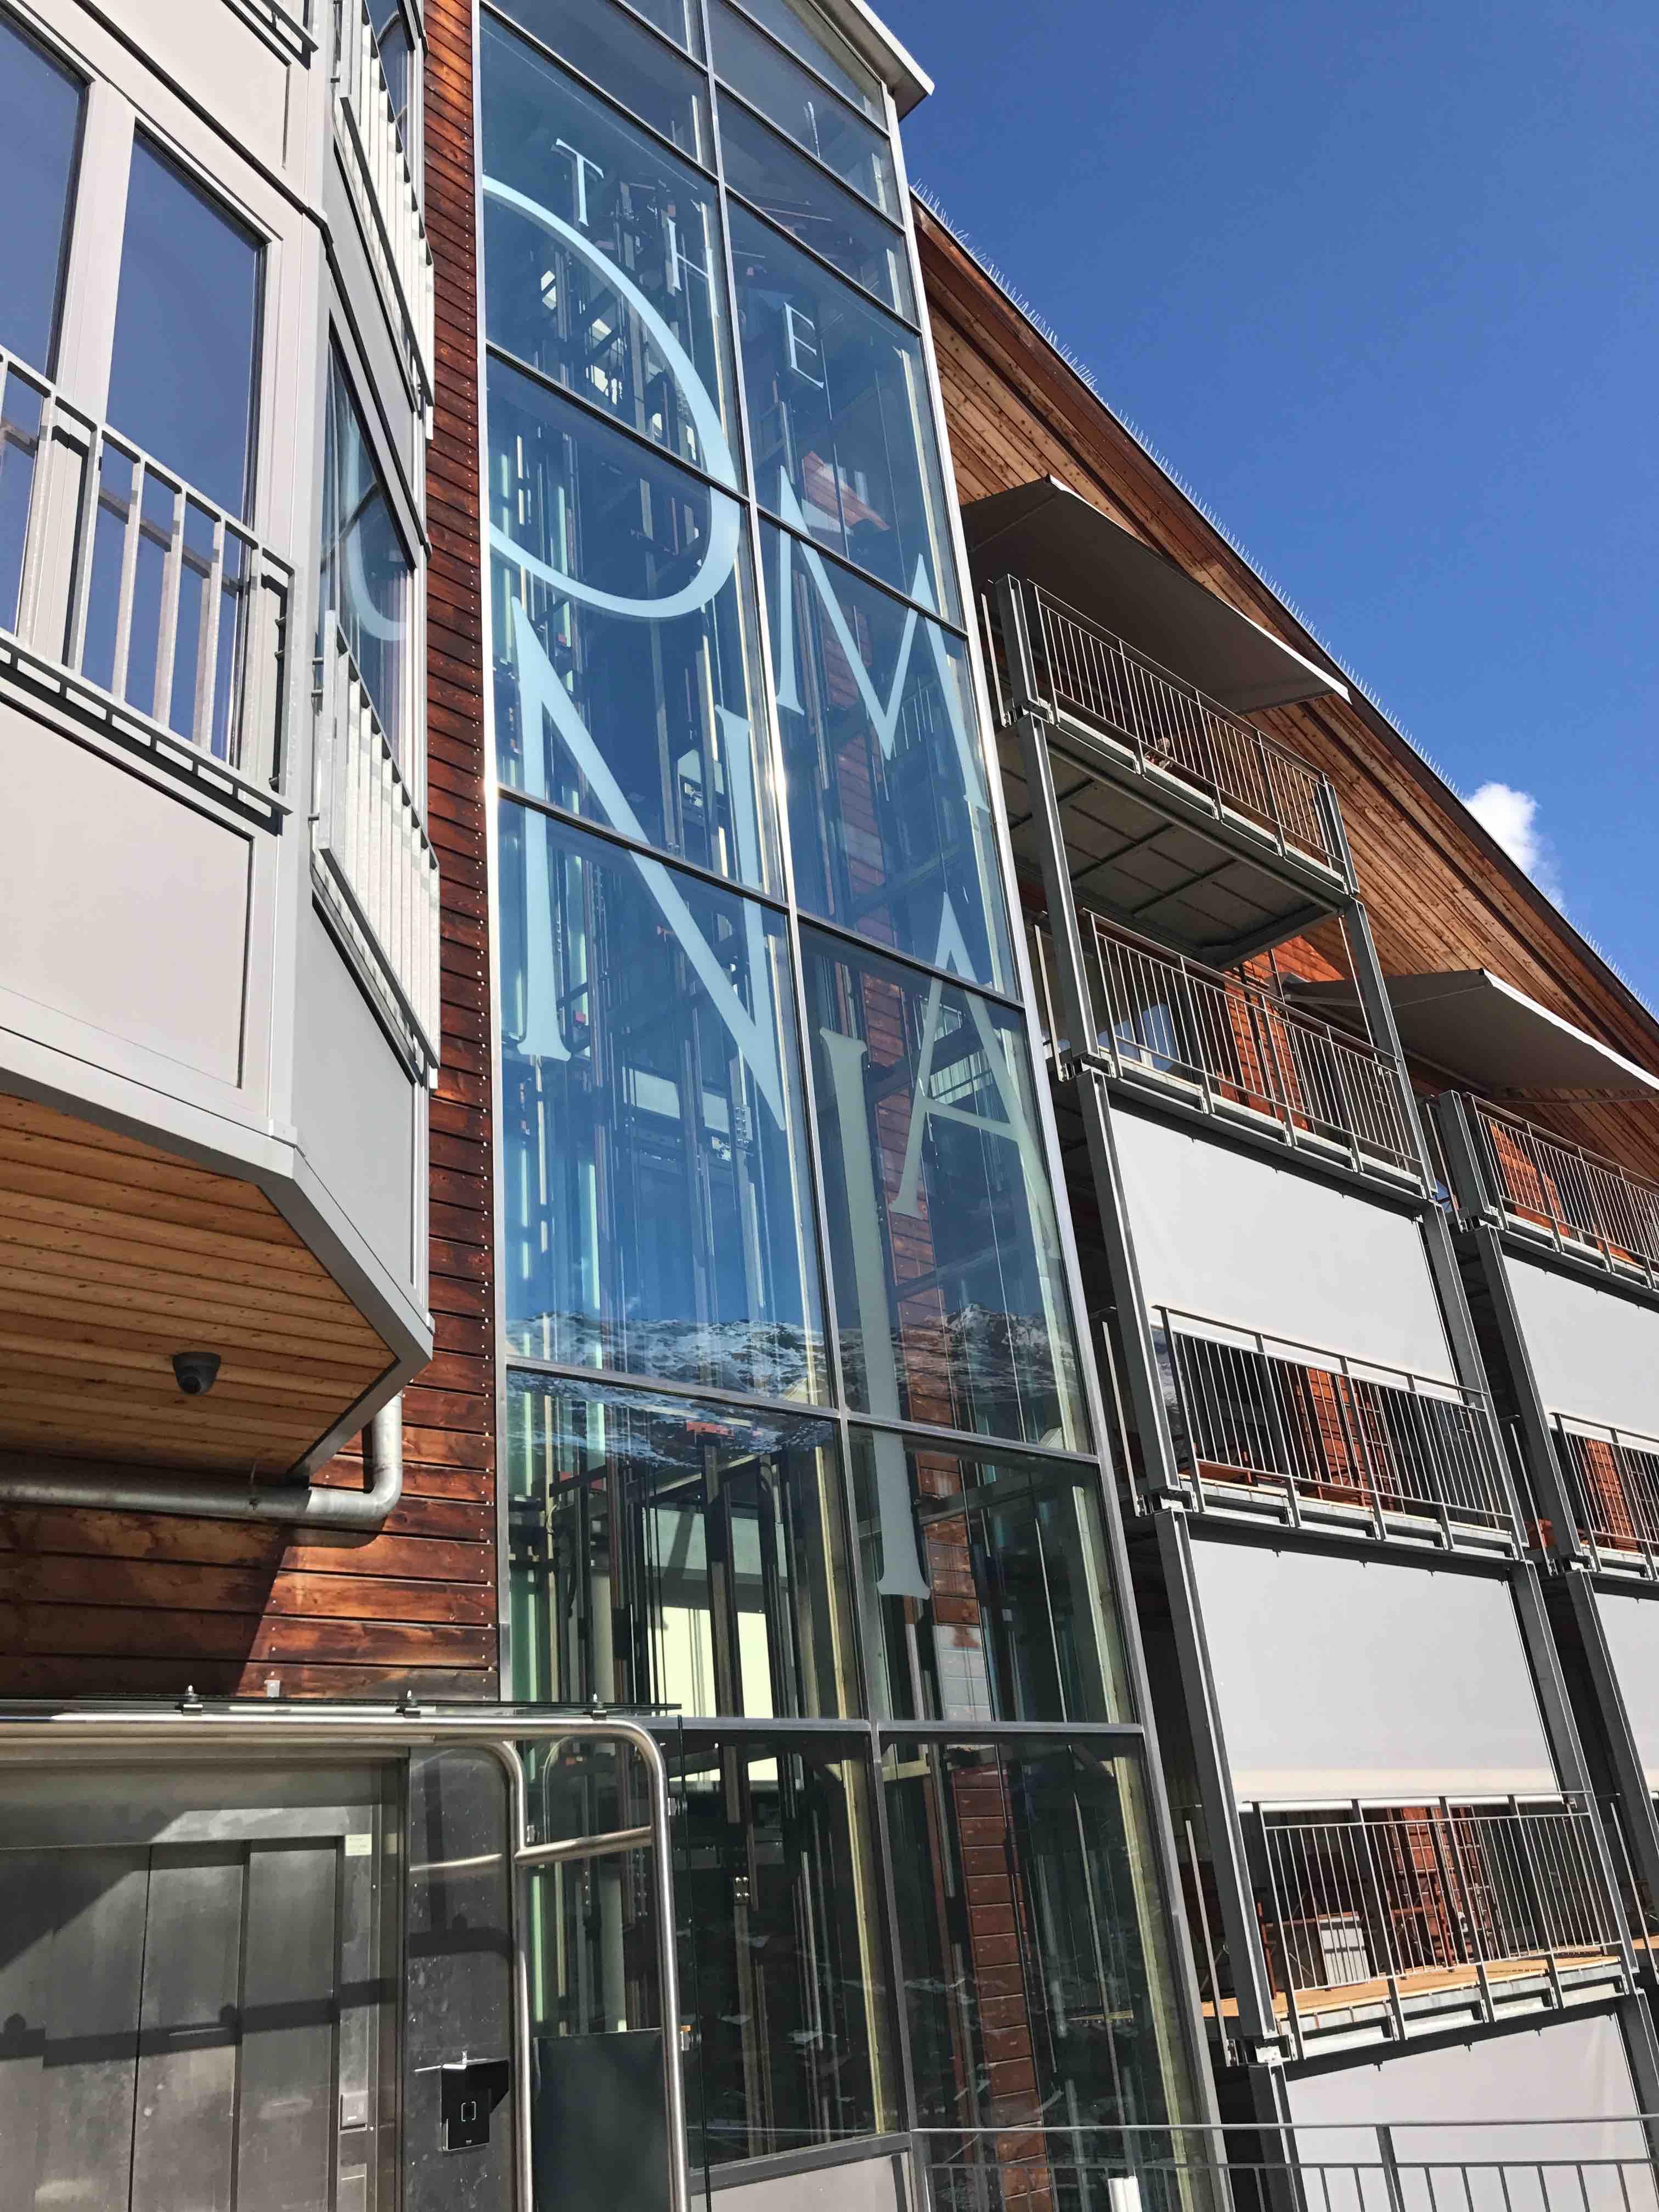 5 amazing hotels in switzerland for 2018 for Design hotel 16 geneva